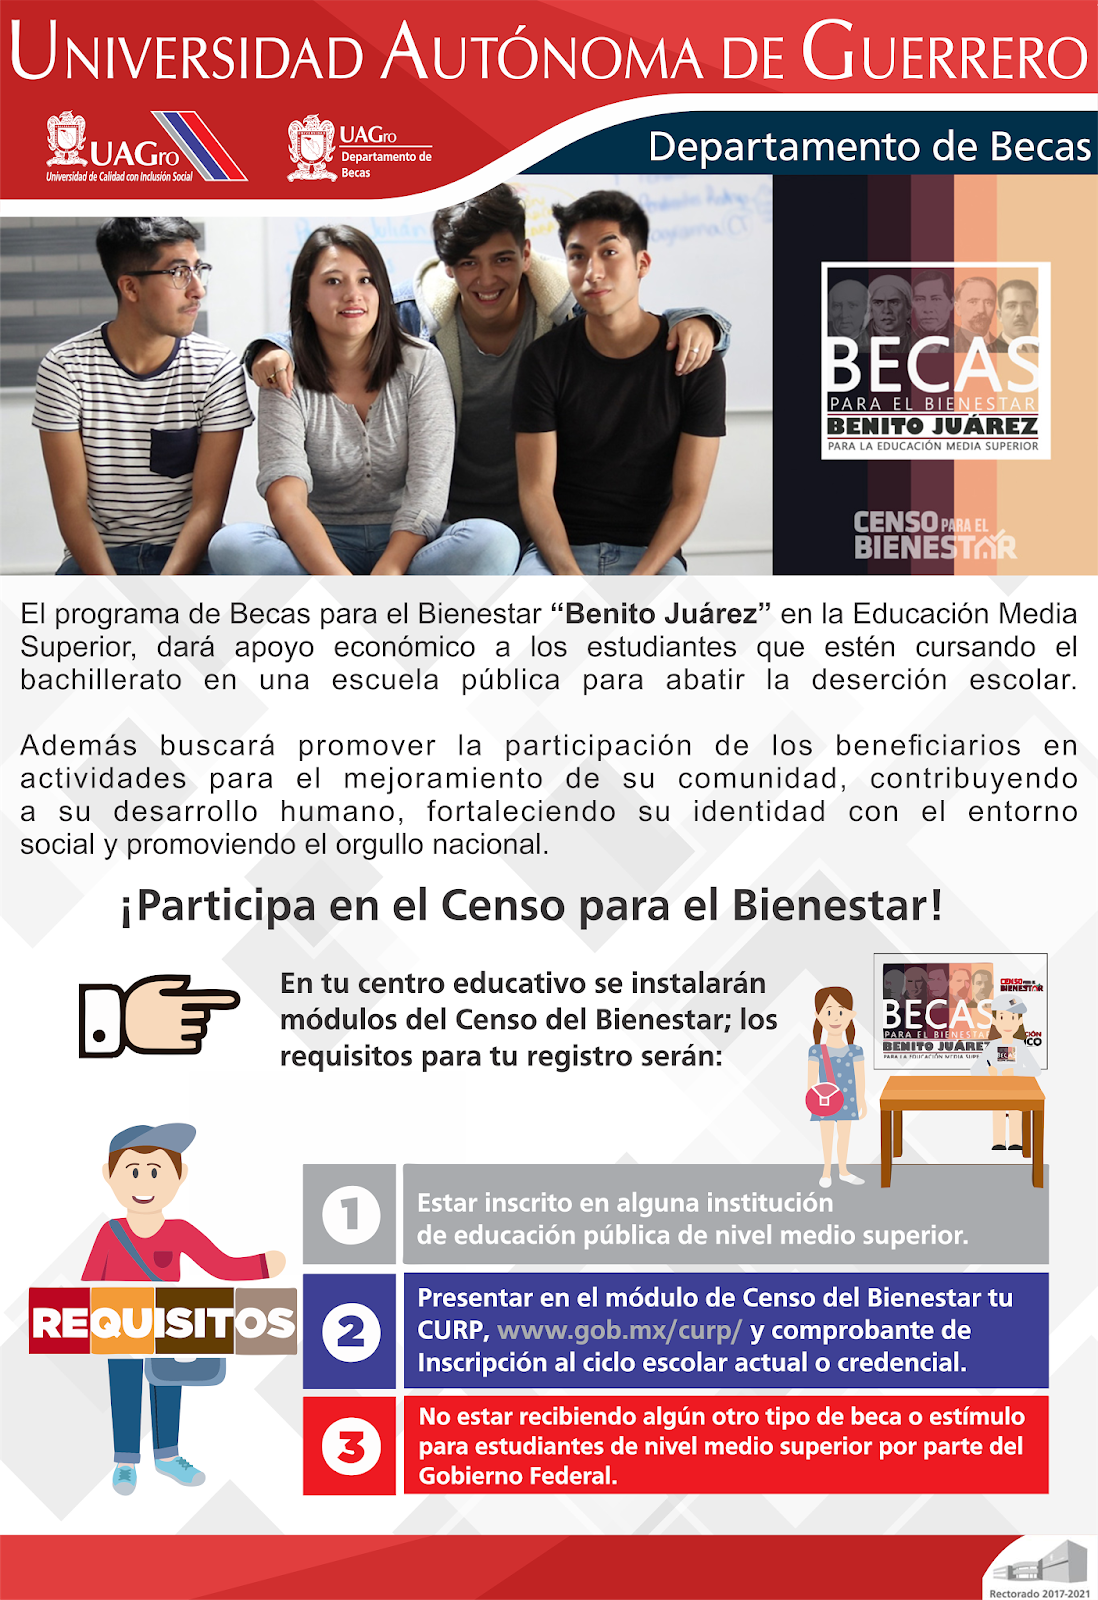 Departamento De Becas Uagro Censo Para El Bienestar Becas